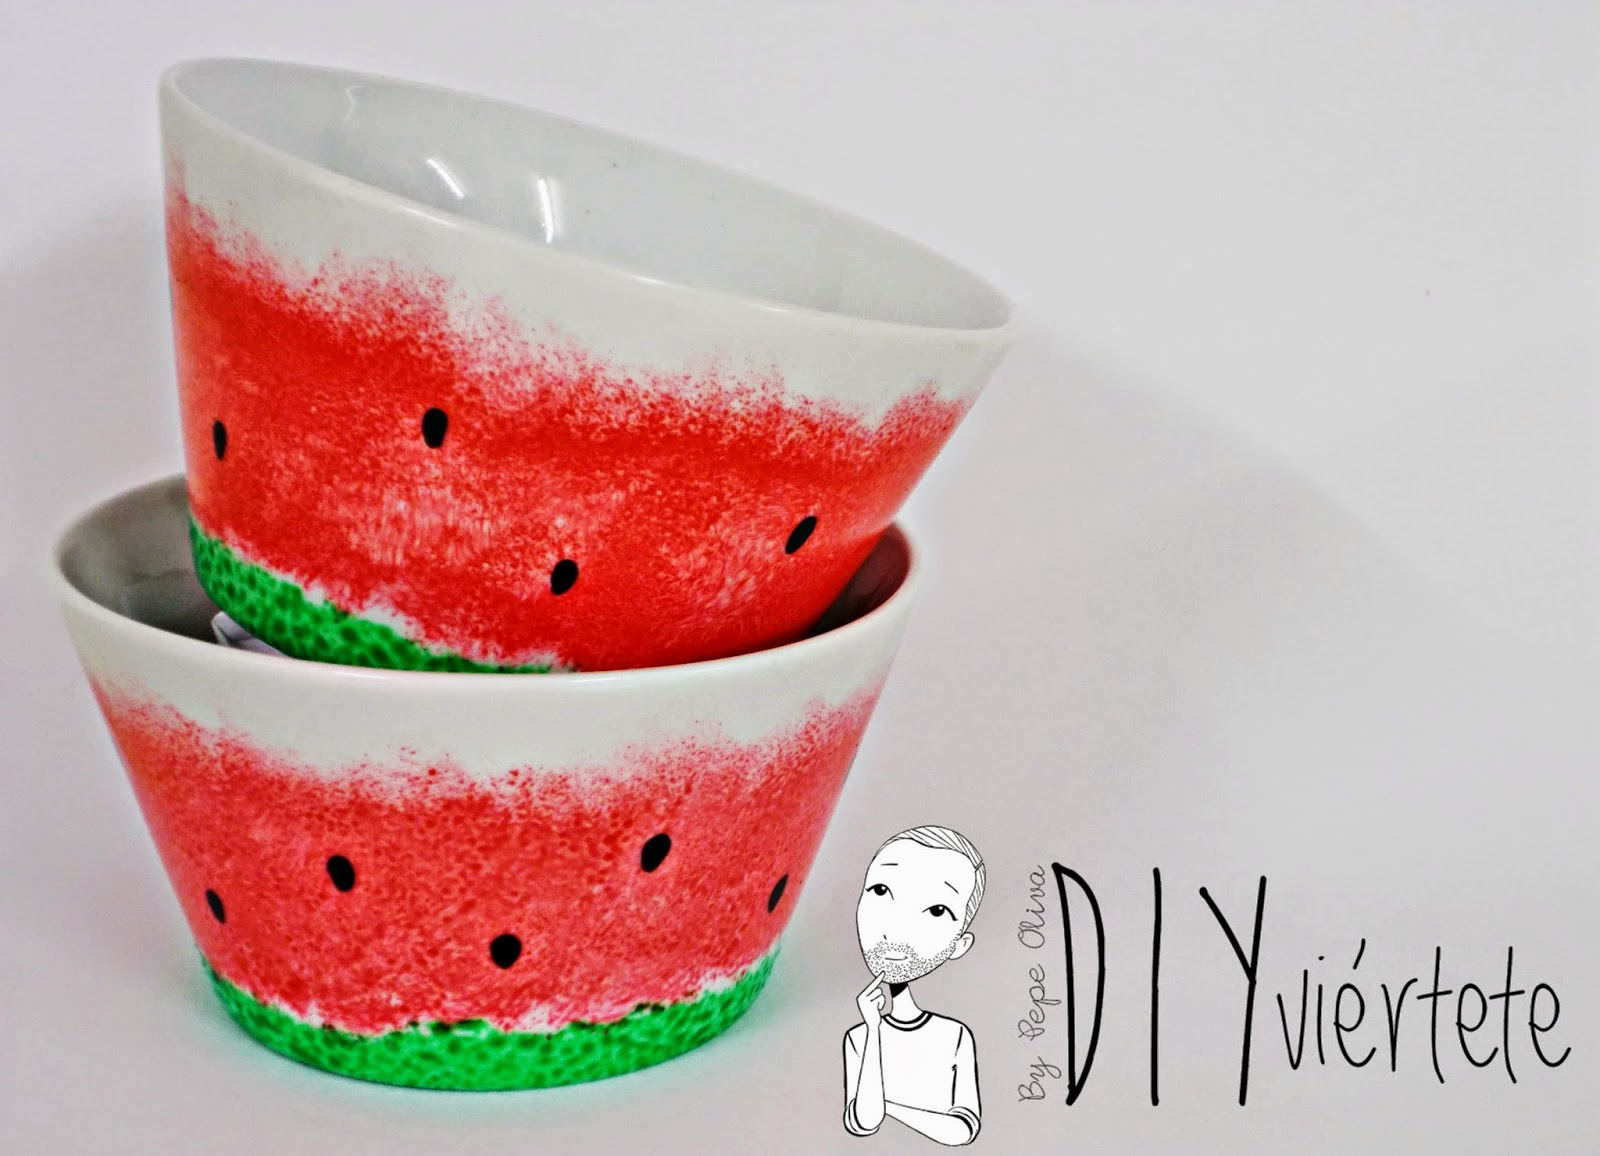 DIY-porcelana-pintar-porcelain-porzellan-sandía-DIYviertete-1